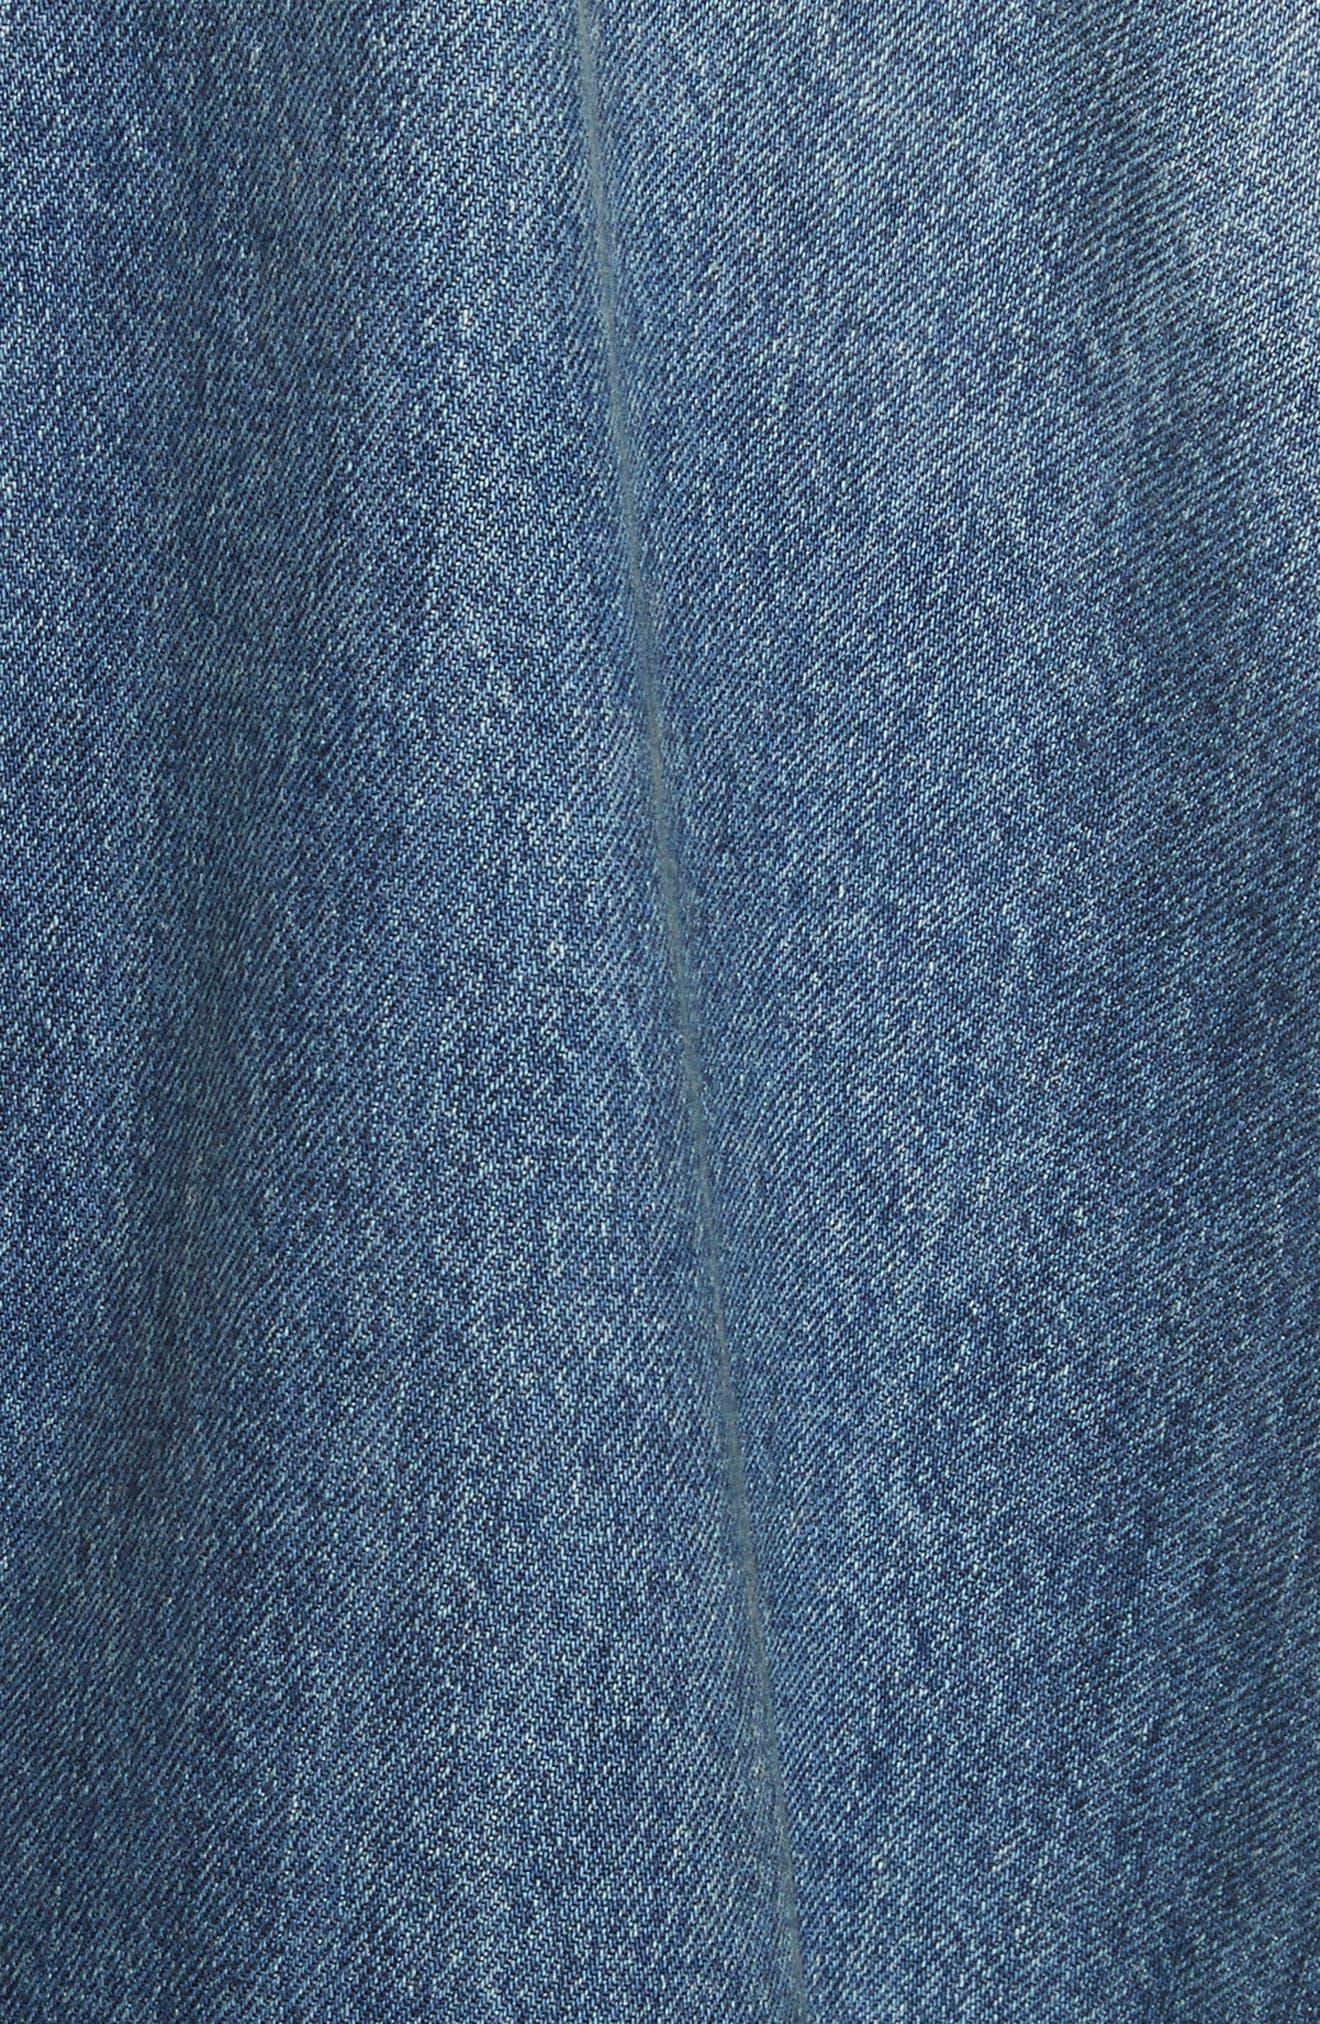 Denim Dress,                             Alternate thumbnail 5, color,                             404